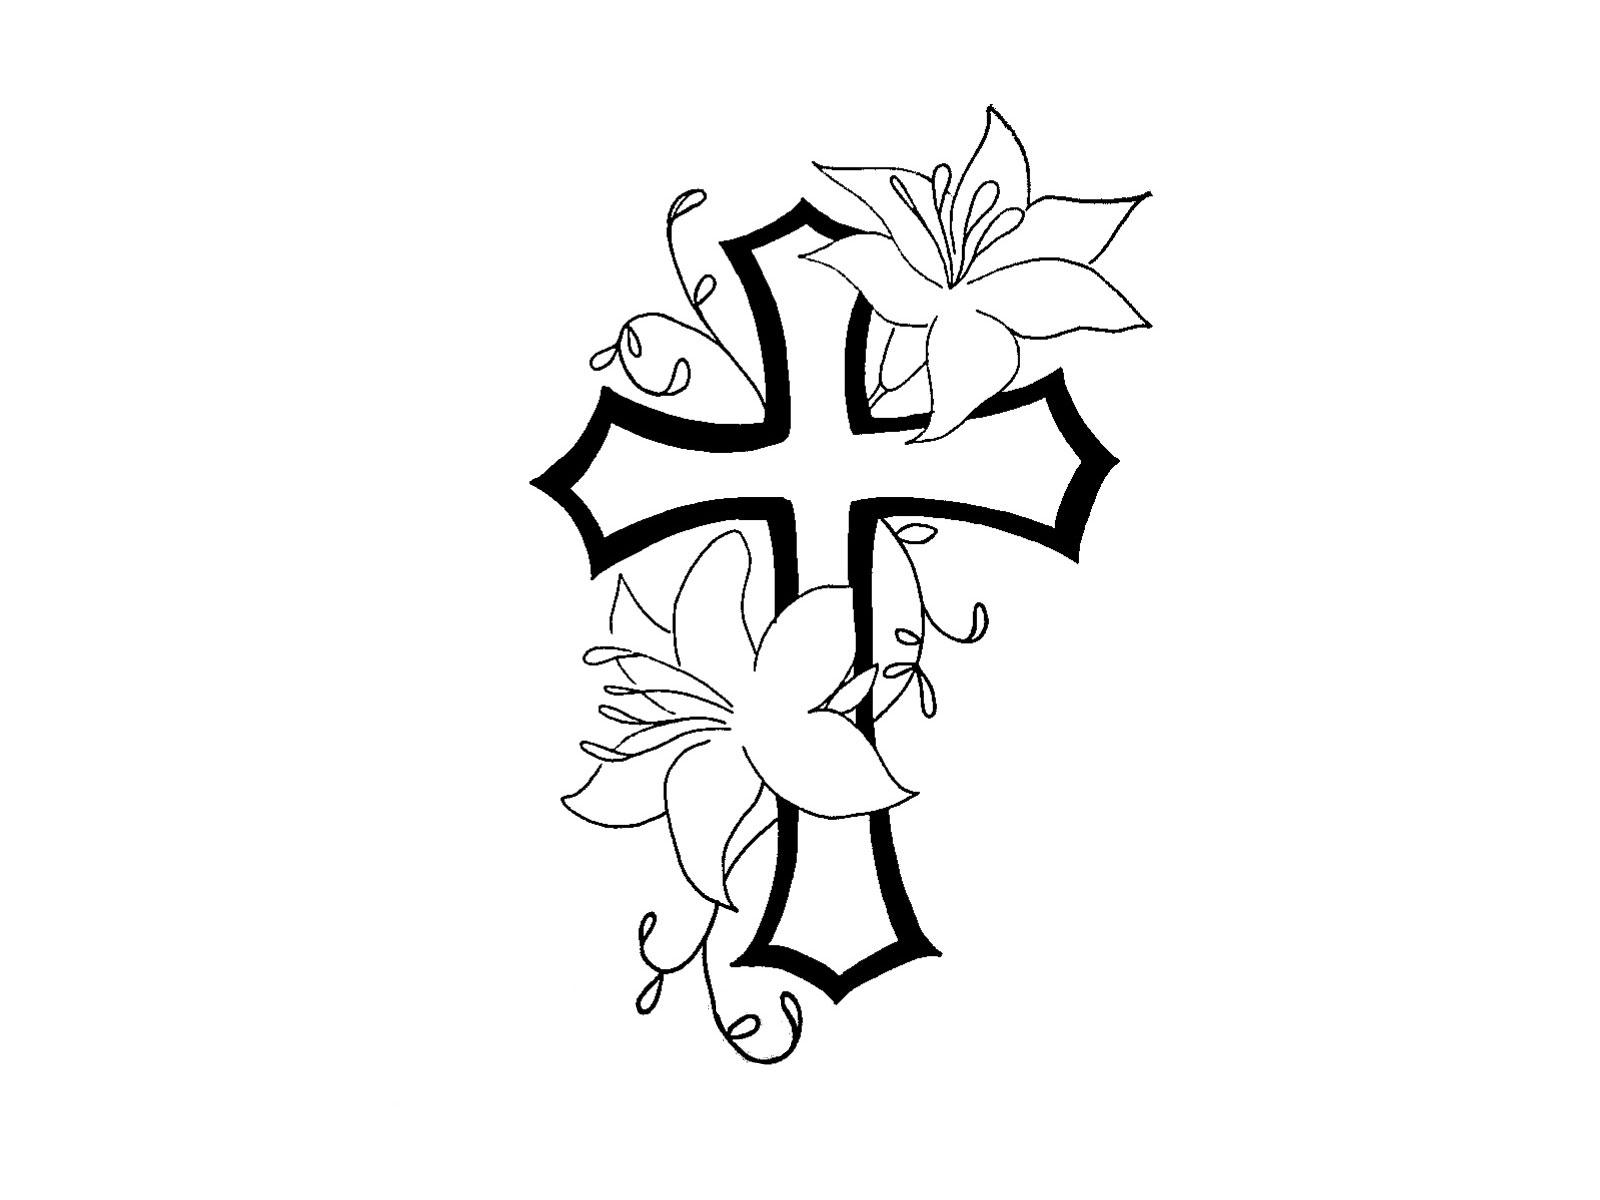 1600x1200 Cross With Flowers Tattoo Cross Flower Tattoo Tattoo Collection